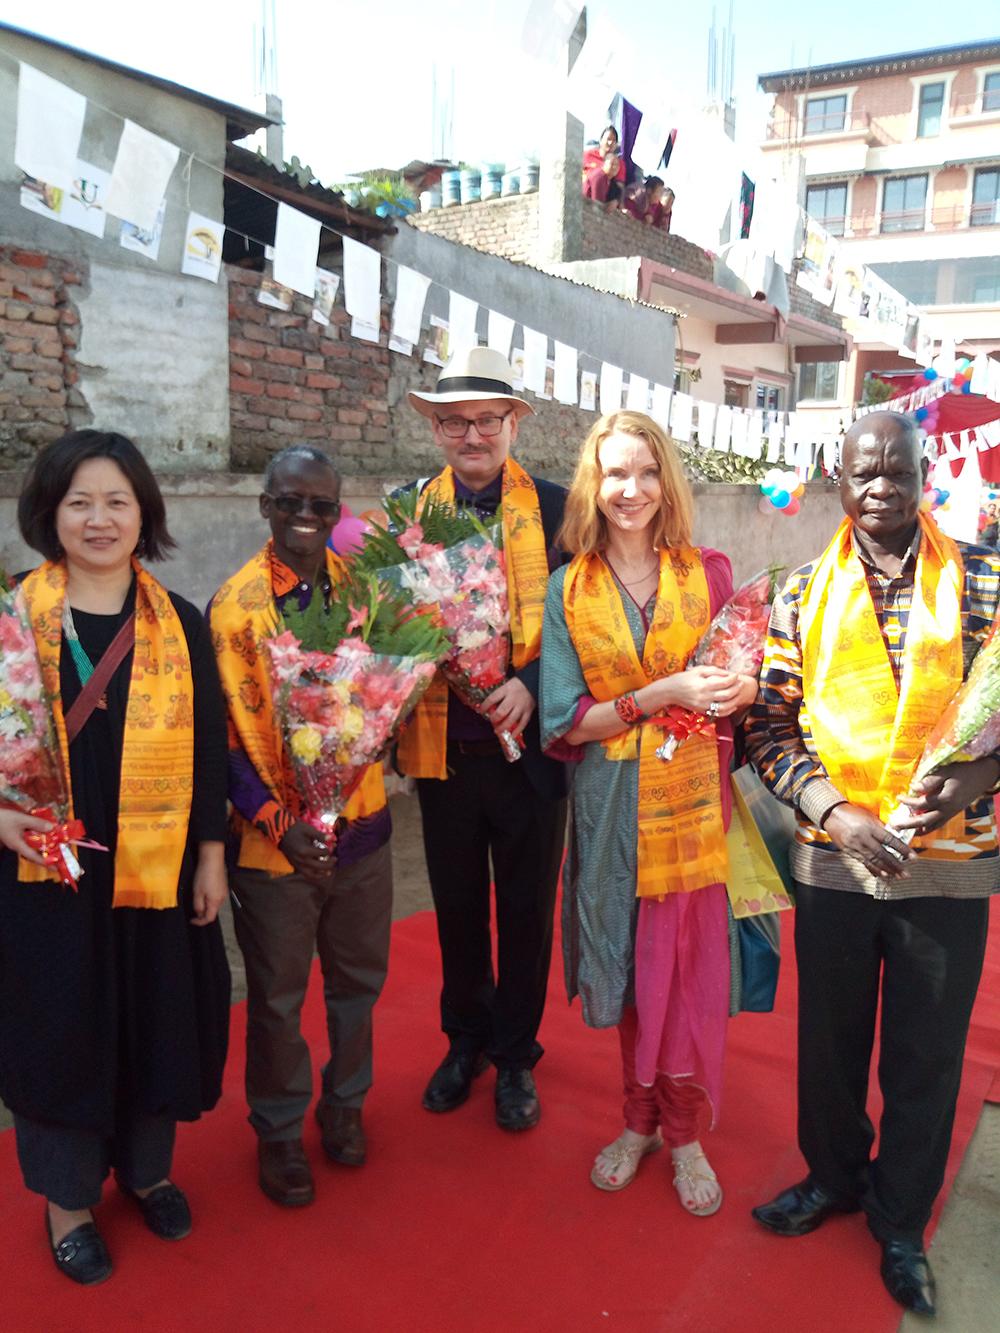 Project team members at the 2018 Nepal Africa Festival (L-R) Dr. William Tayeebwa, Erik Eileng, Prof. Kristin Skare Orgeret and Dr. Chaplain Kara Yokoju.